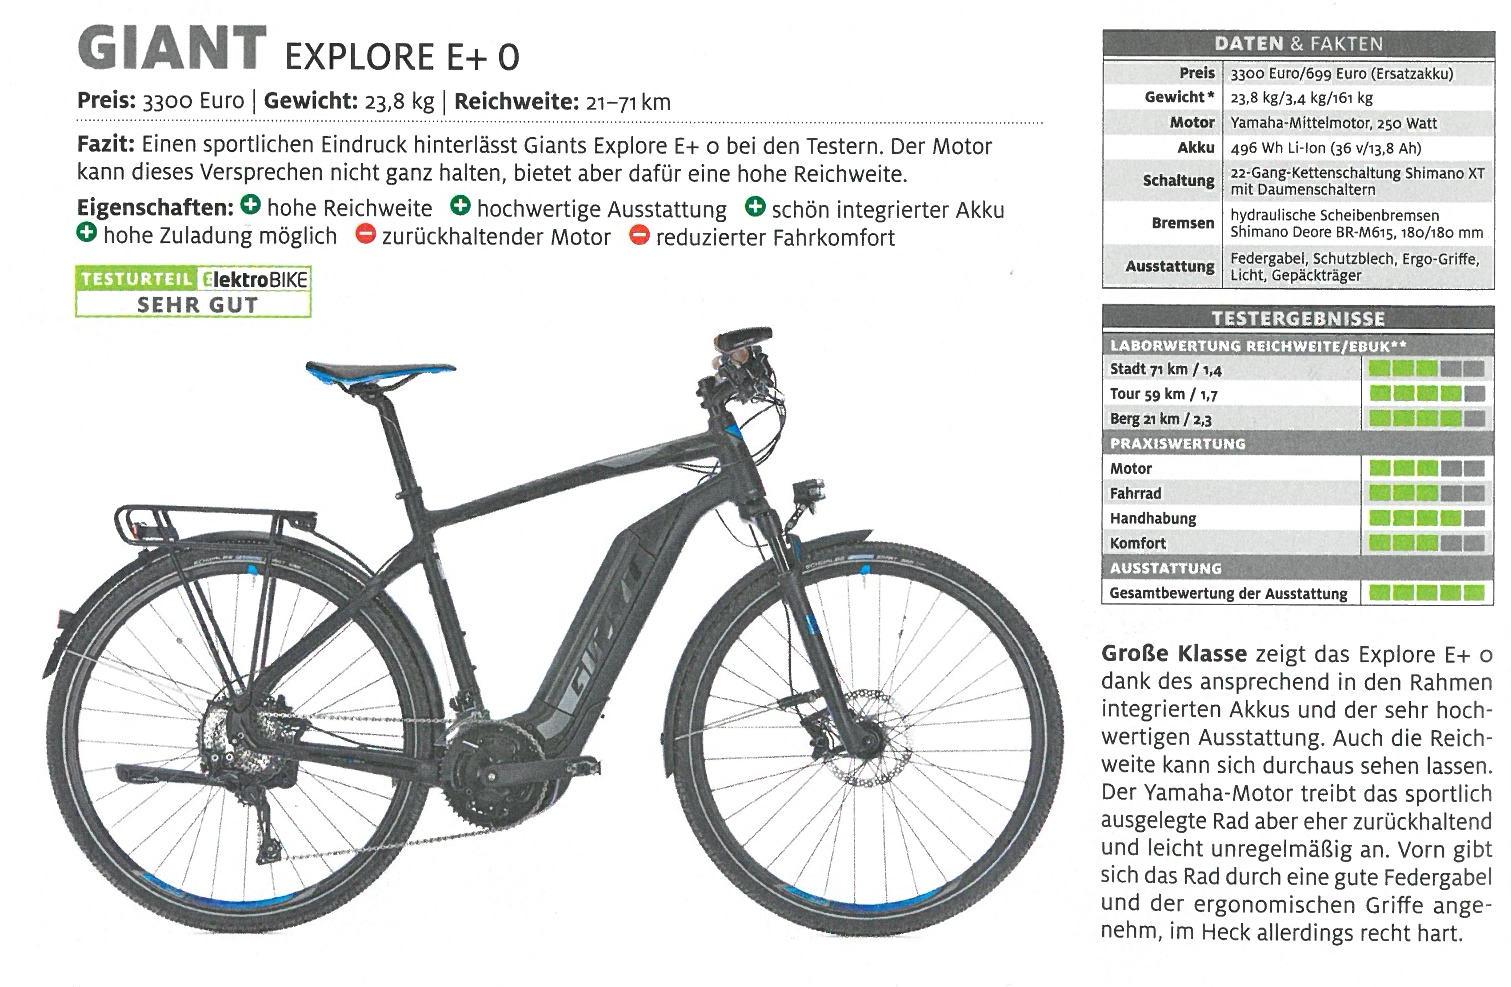 Explore E+ 0 in ElektroBIKE 01_17